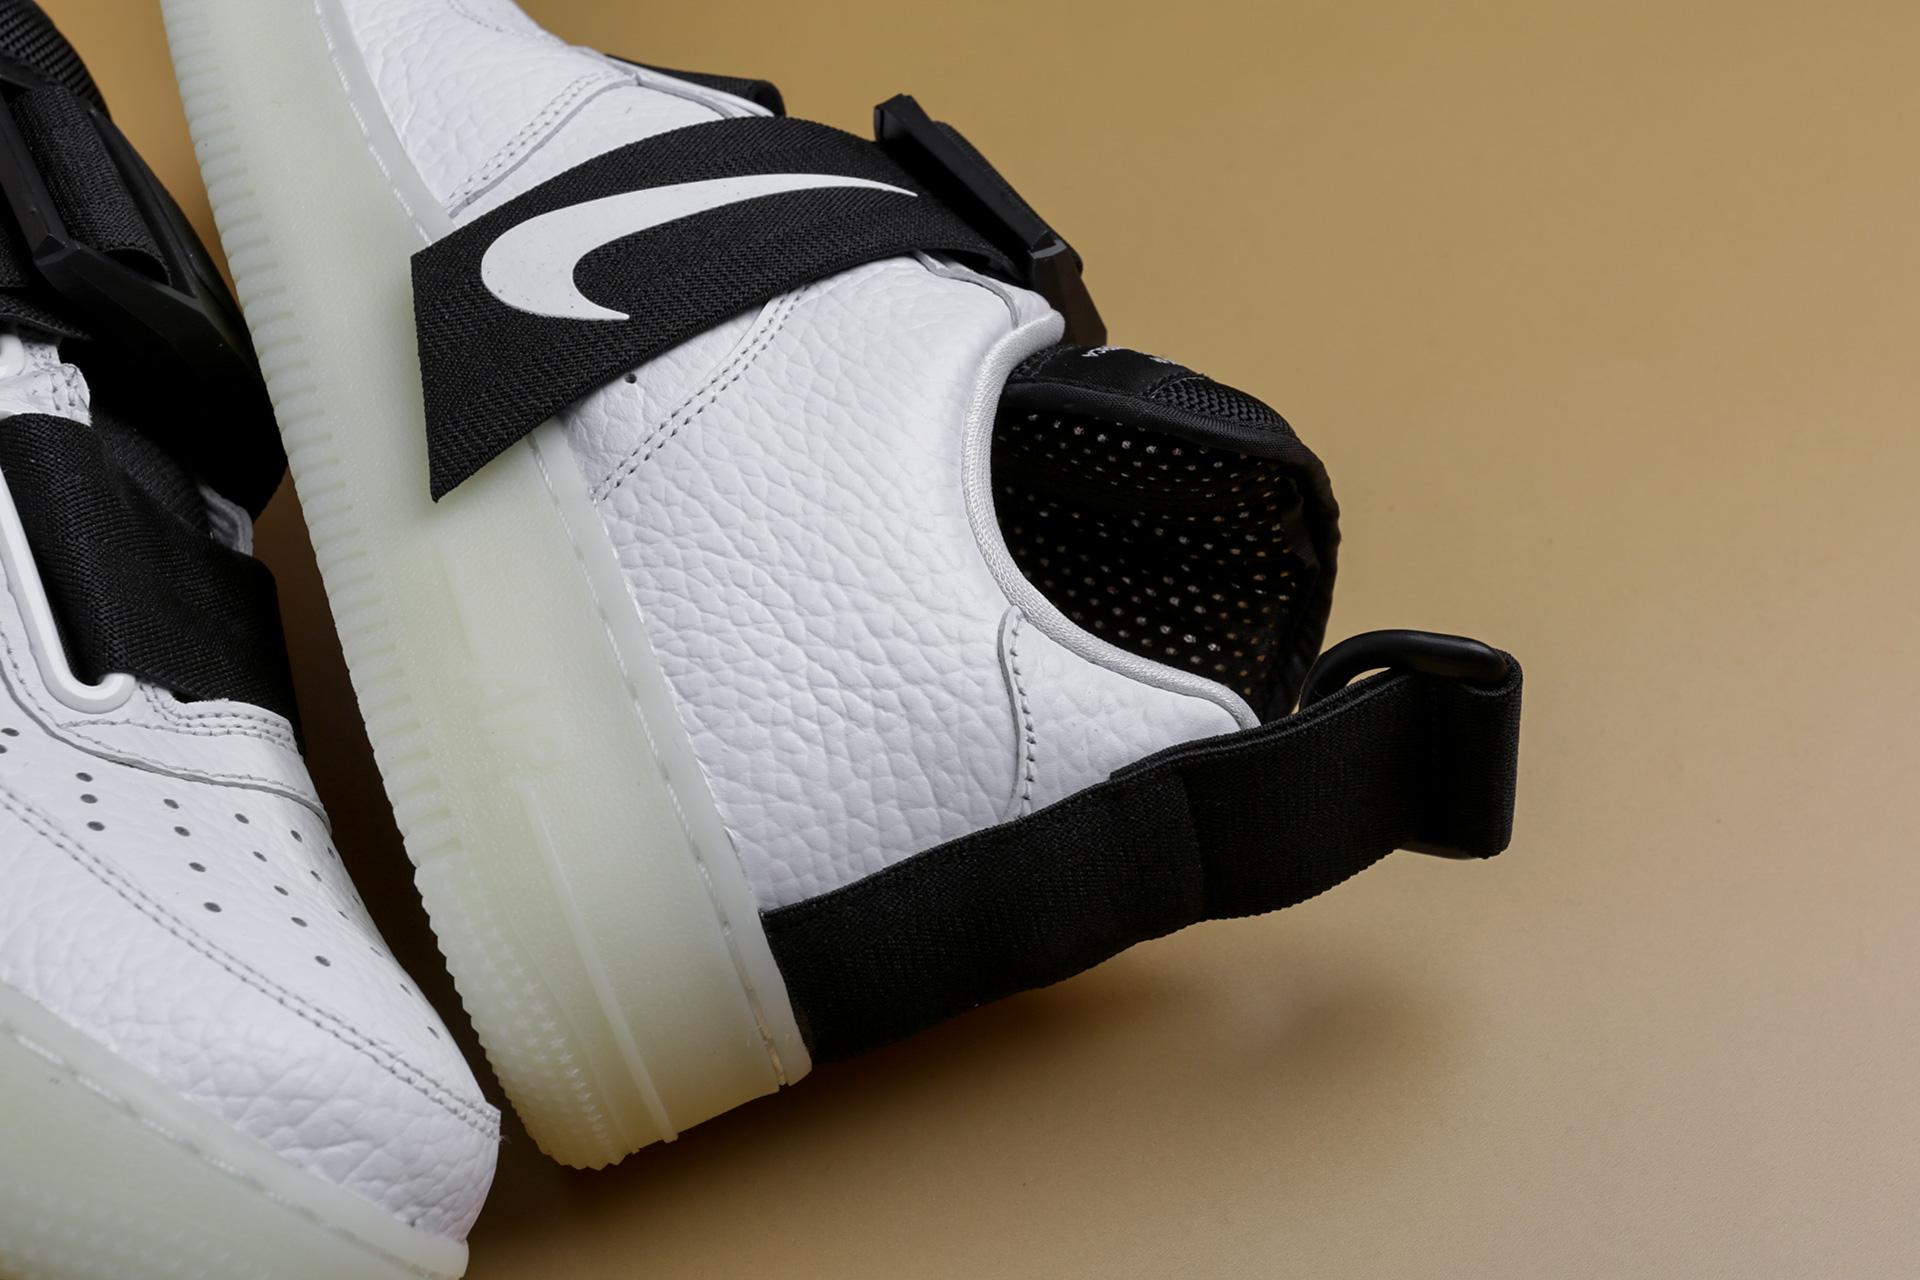 95ea4229 ... Купить мужские белые кроссовки Nike Air Force 1 Utility QS - фото 3  картинки ...